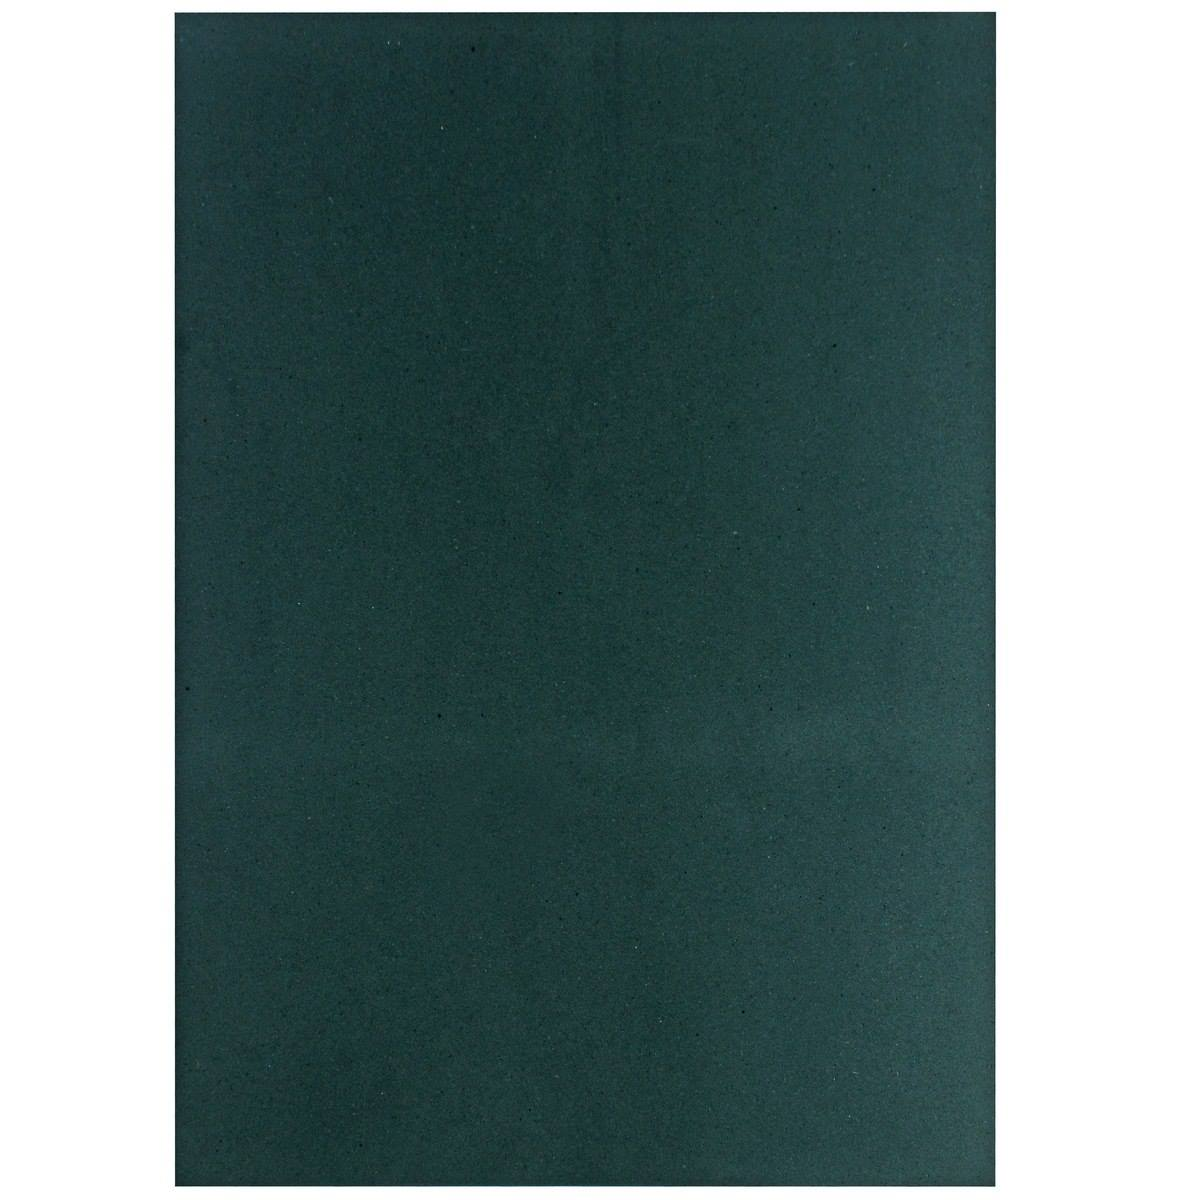 Foam Sheets A4 Size Without Sticker 3MM Dark Green